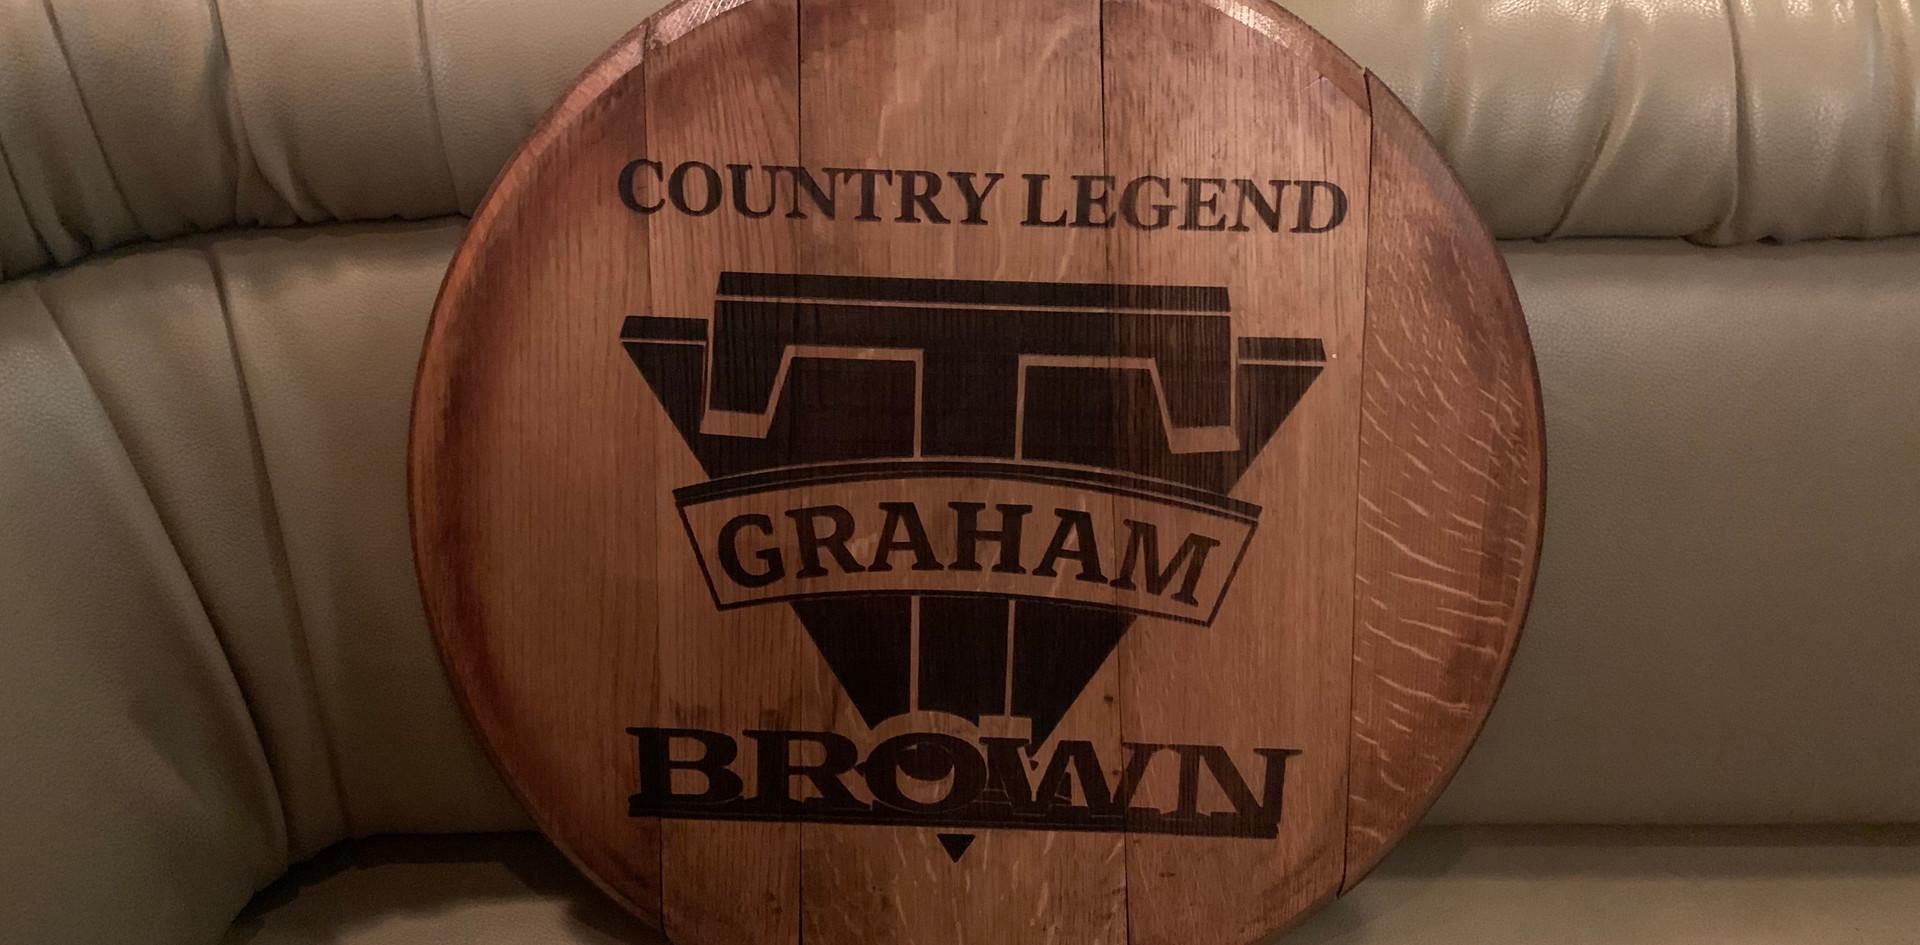 tgraham whiskey cap.jpeg